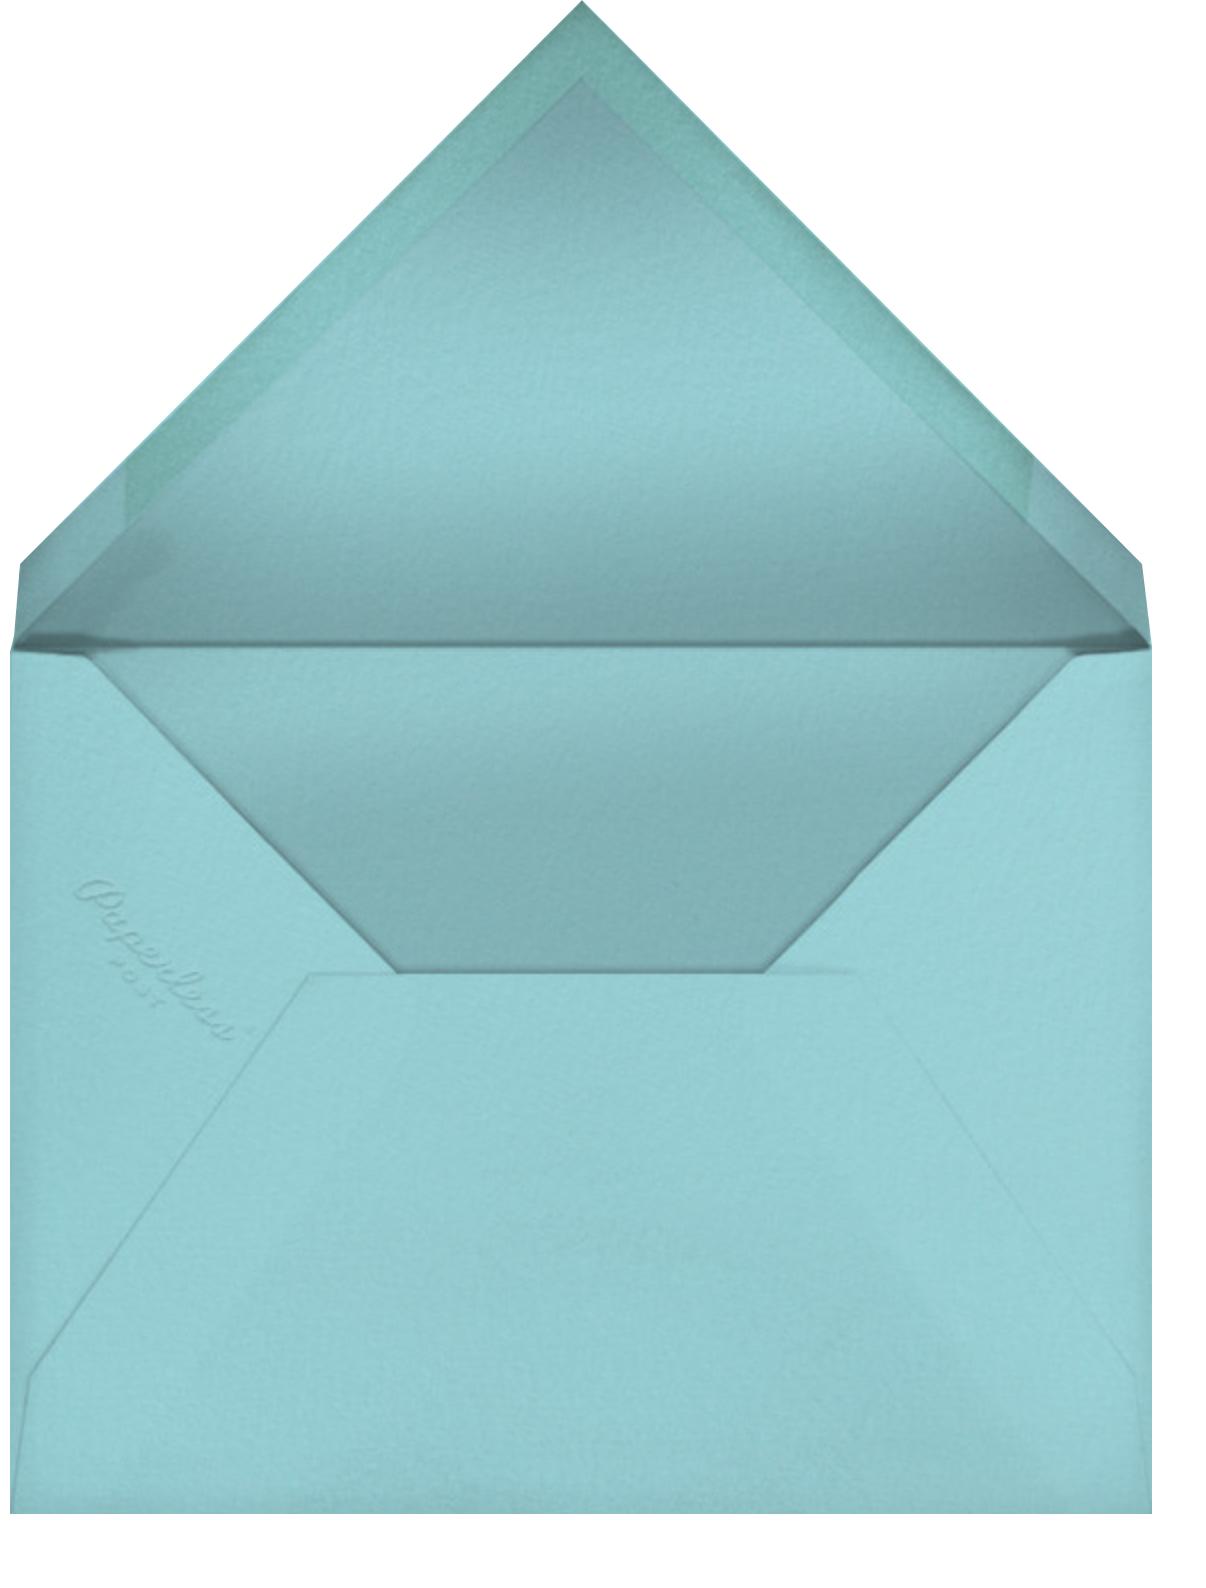 Wingspan - Meri Meri - Just because - envelope back